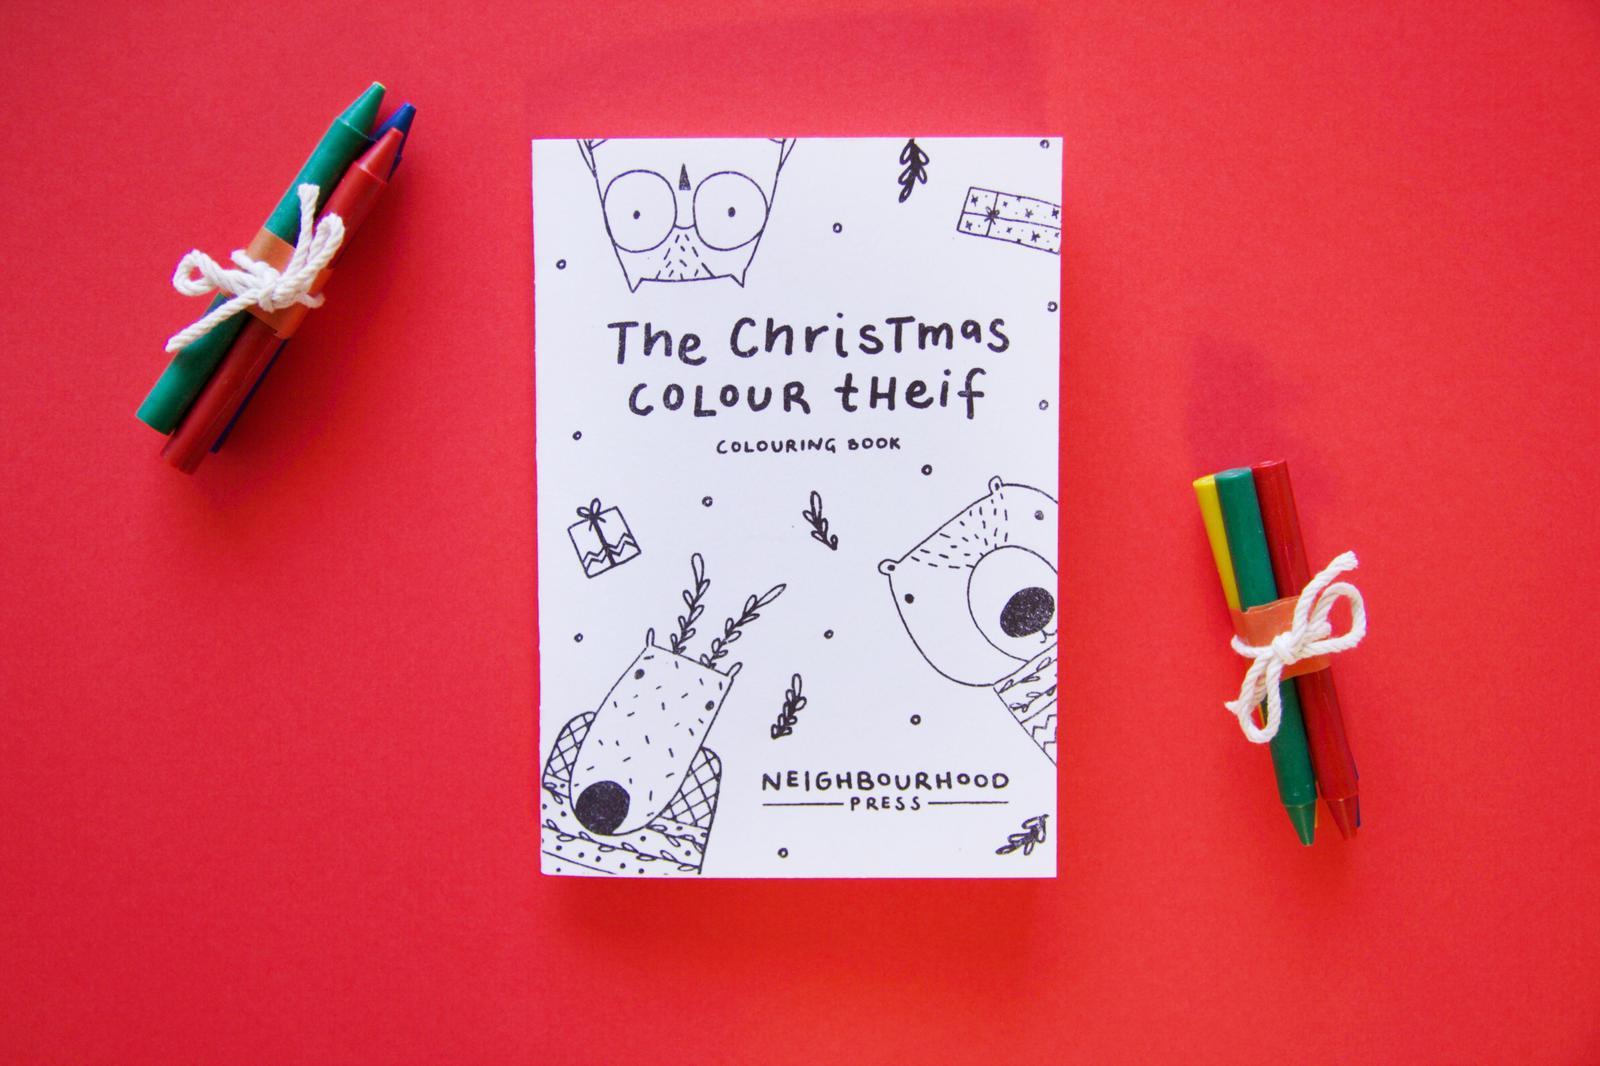 The Christmas Colour Thief Colouring Book